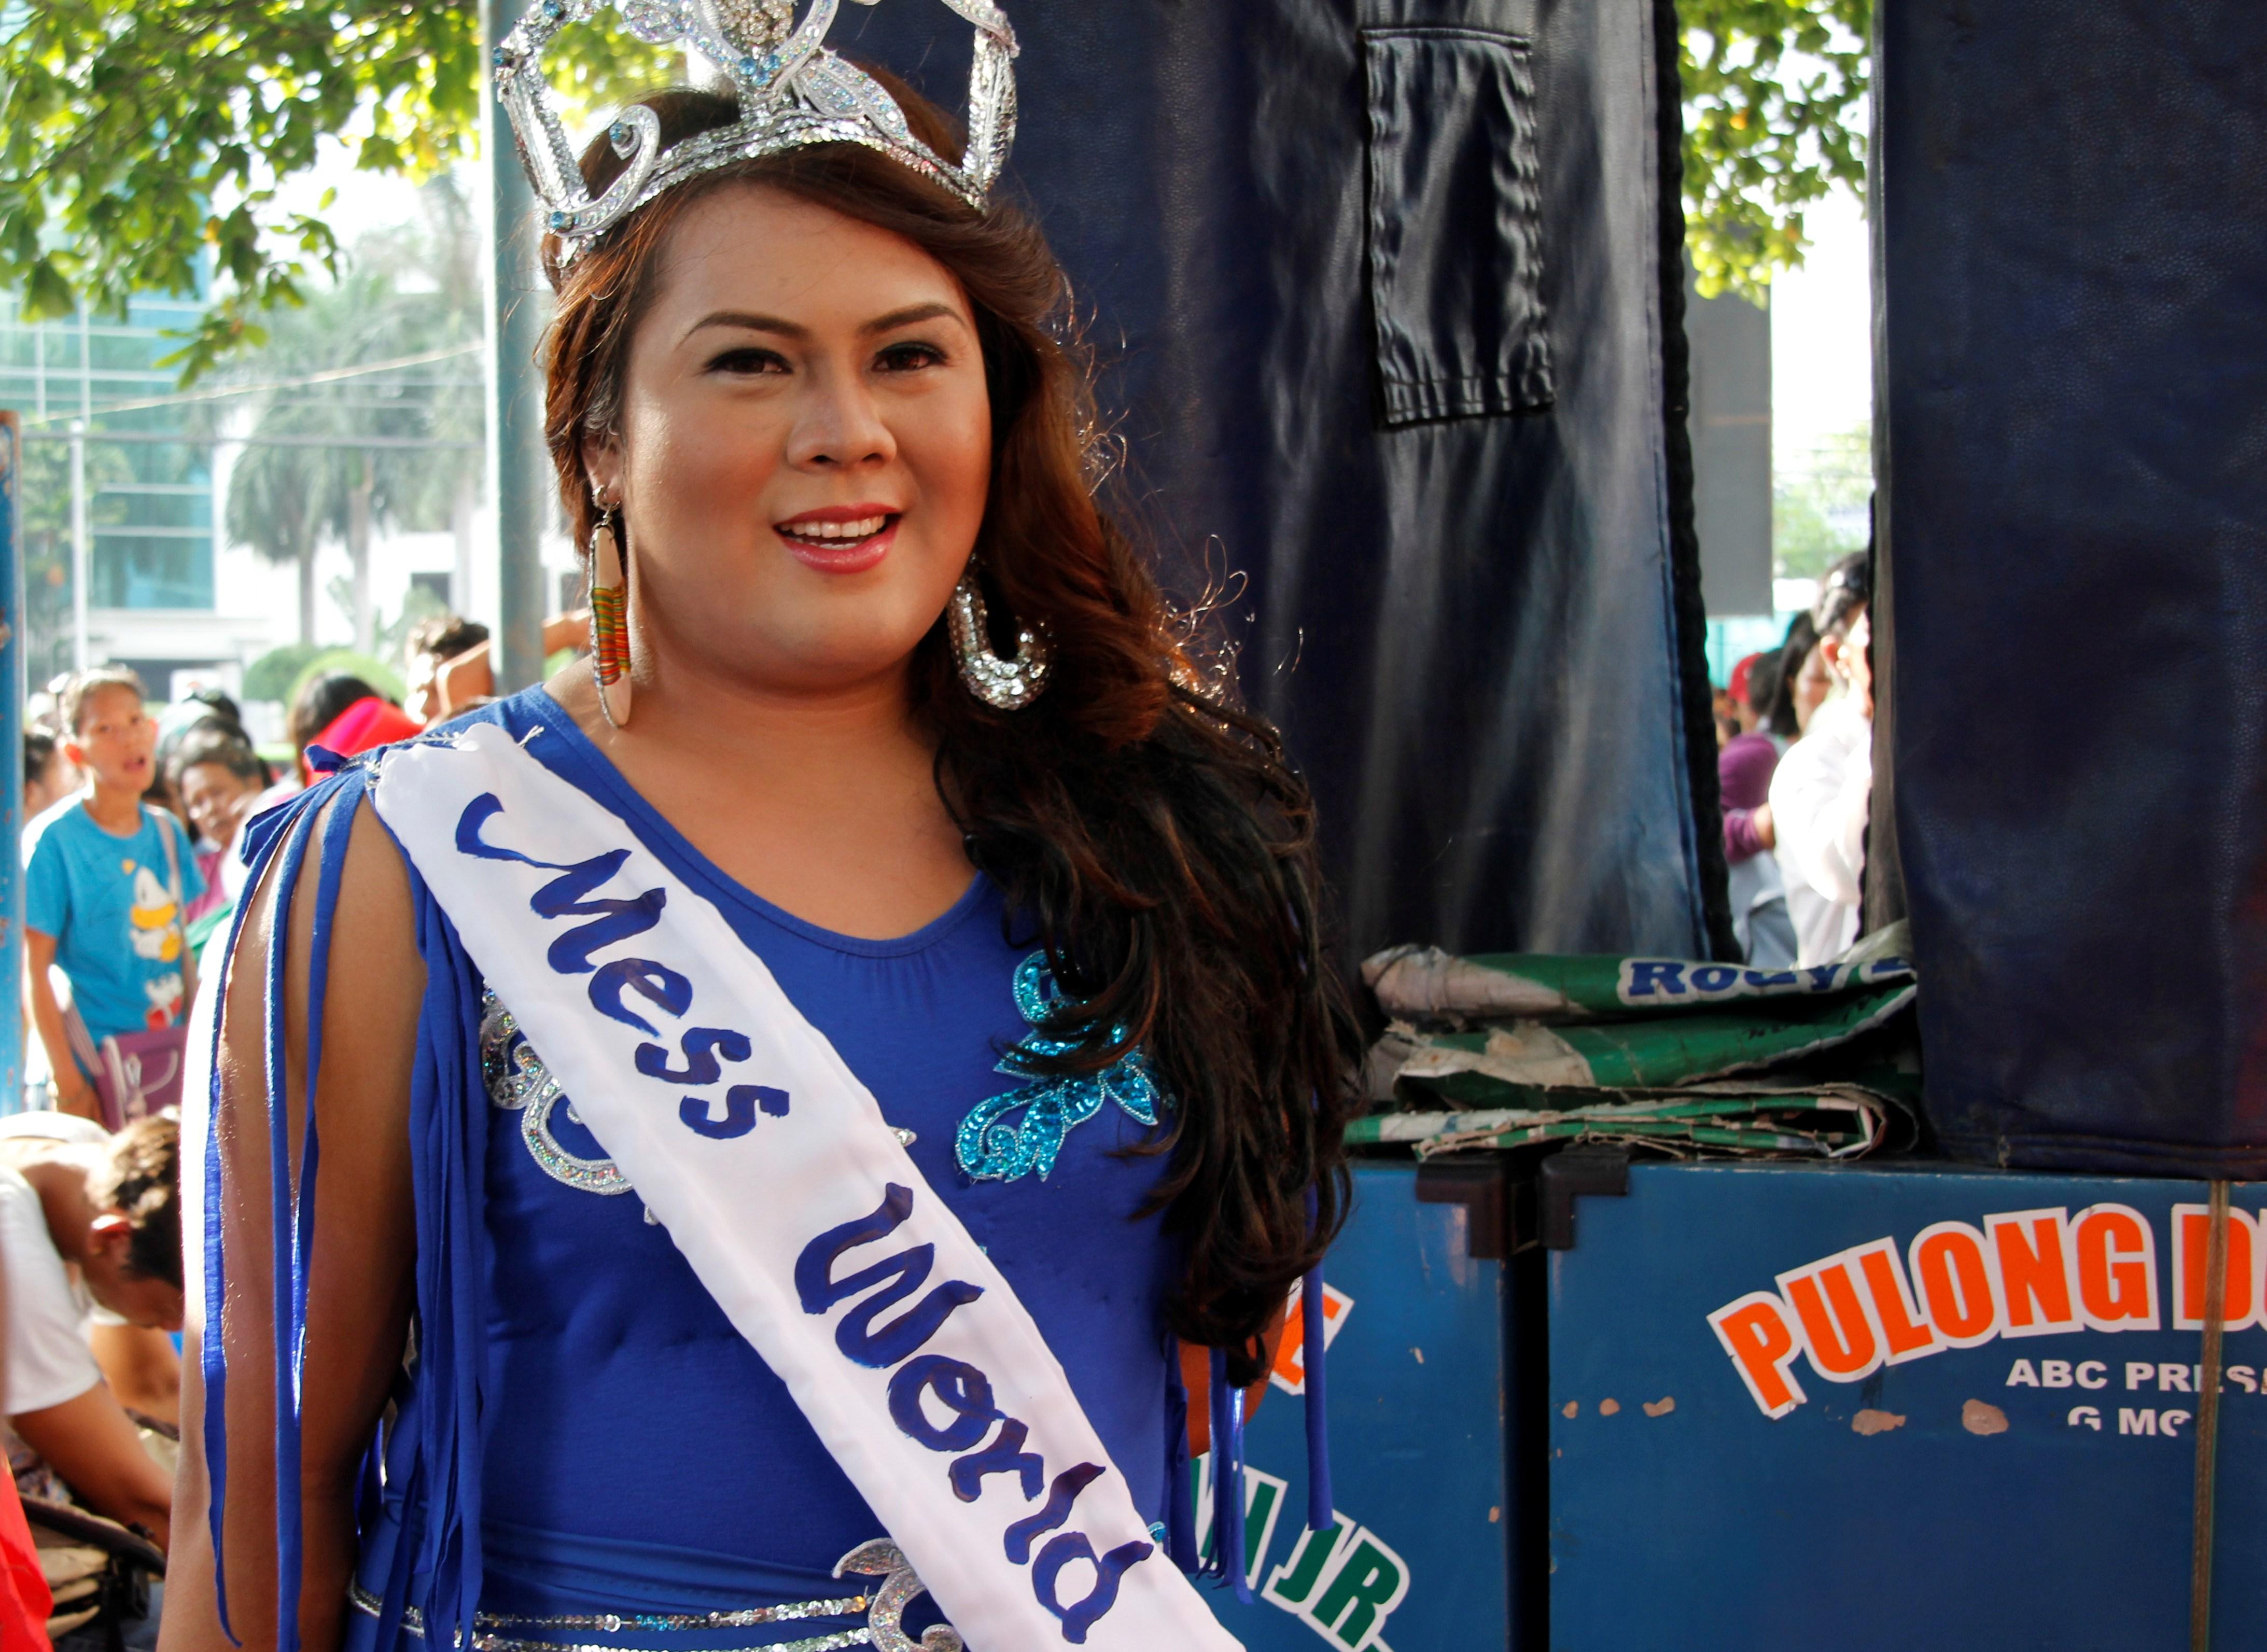 'Megan Yan' arrives at the anti-pork rally. (photo by Medel V. Hernani)